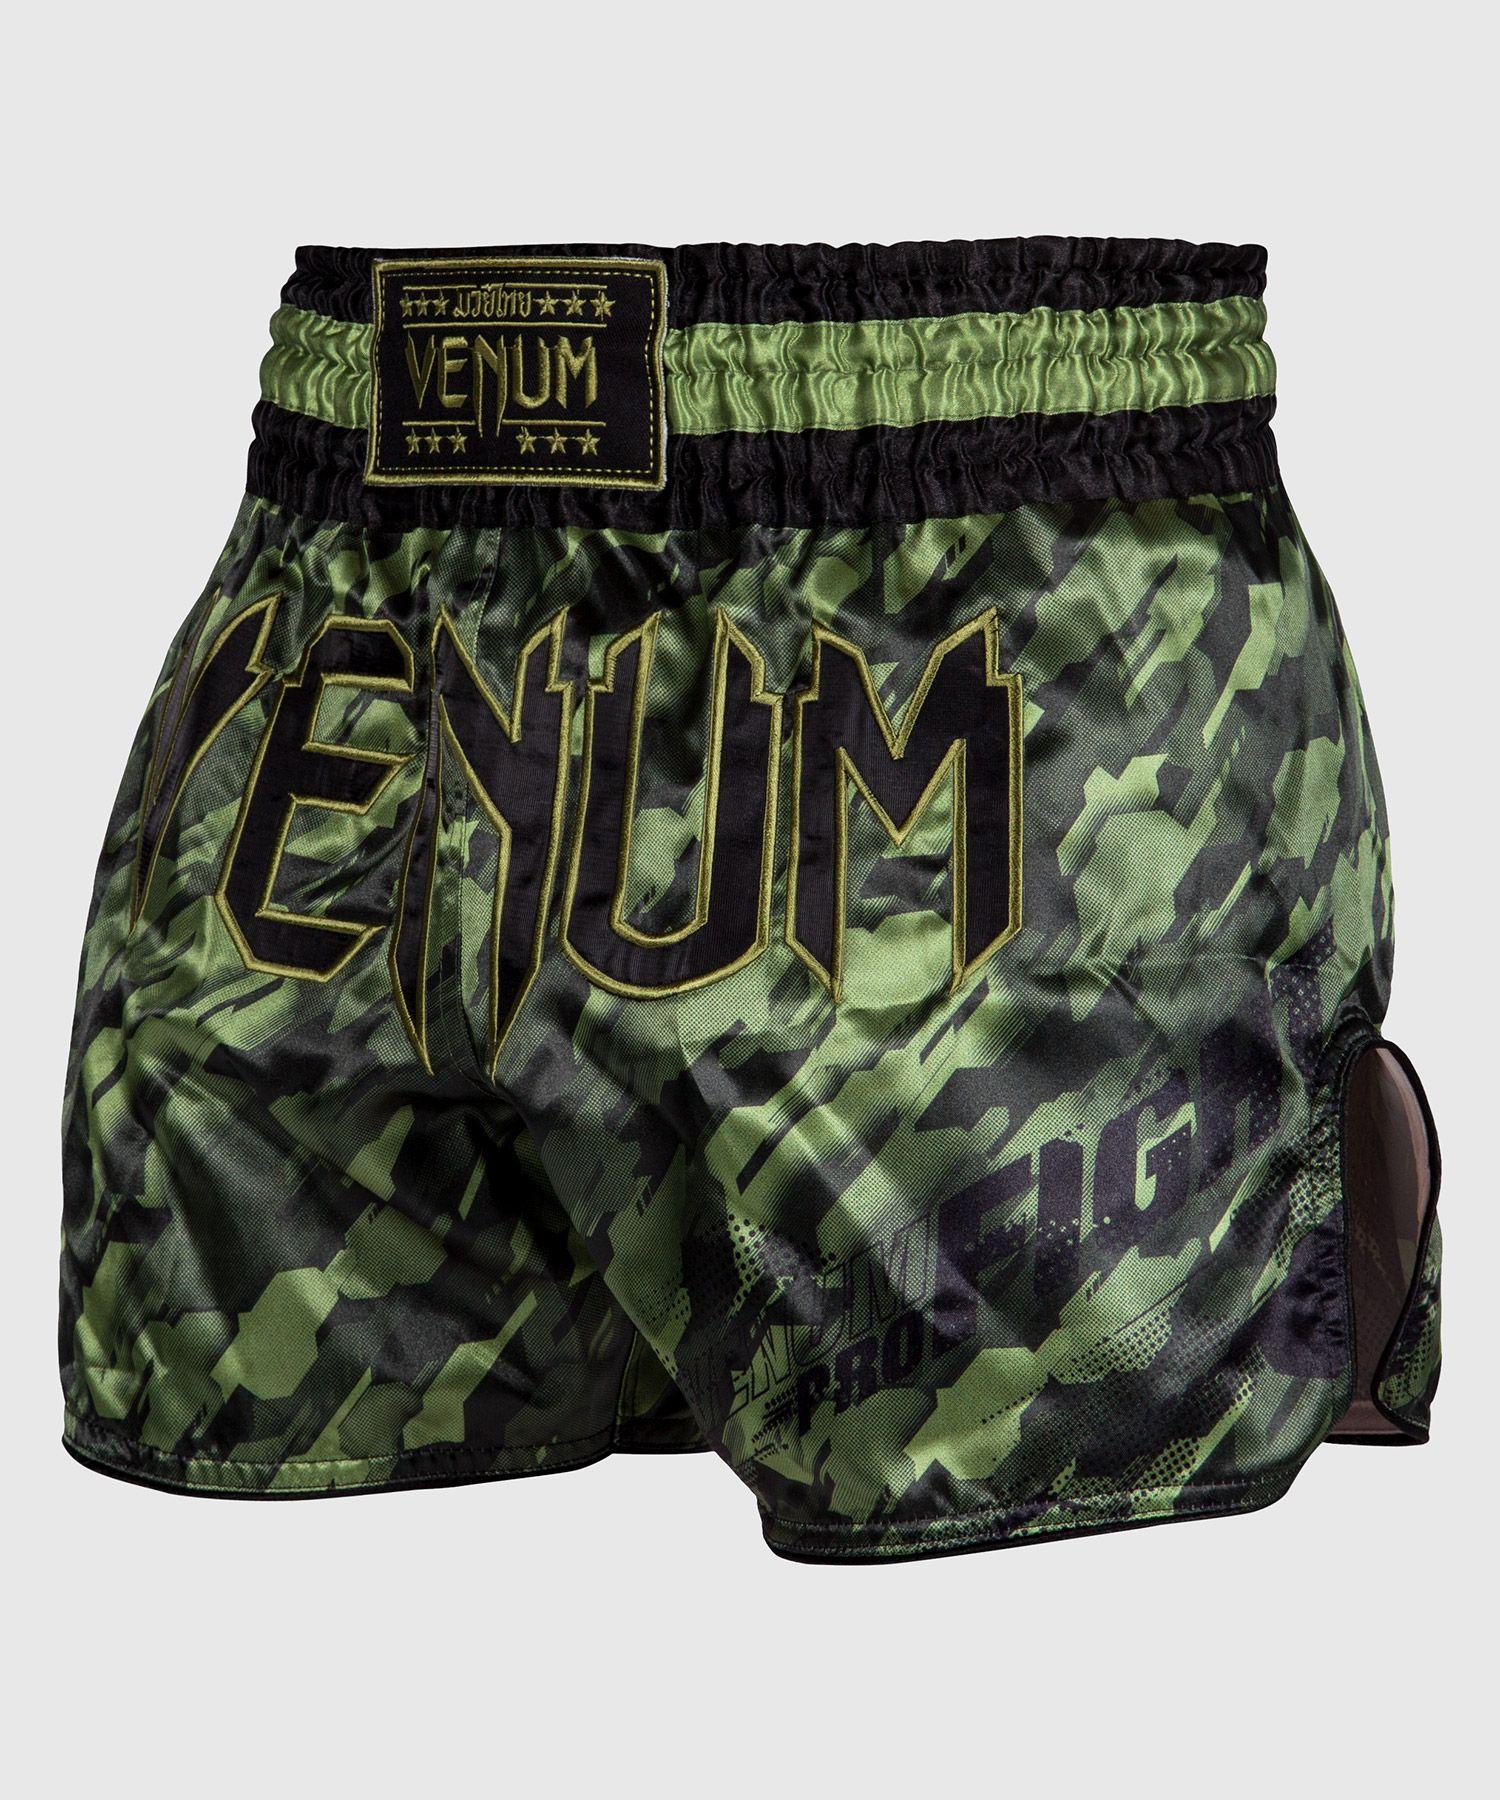 Pantaloncini da Muay Thai Venum Tecmo - Cachi